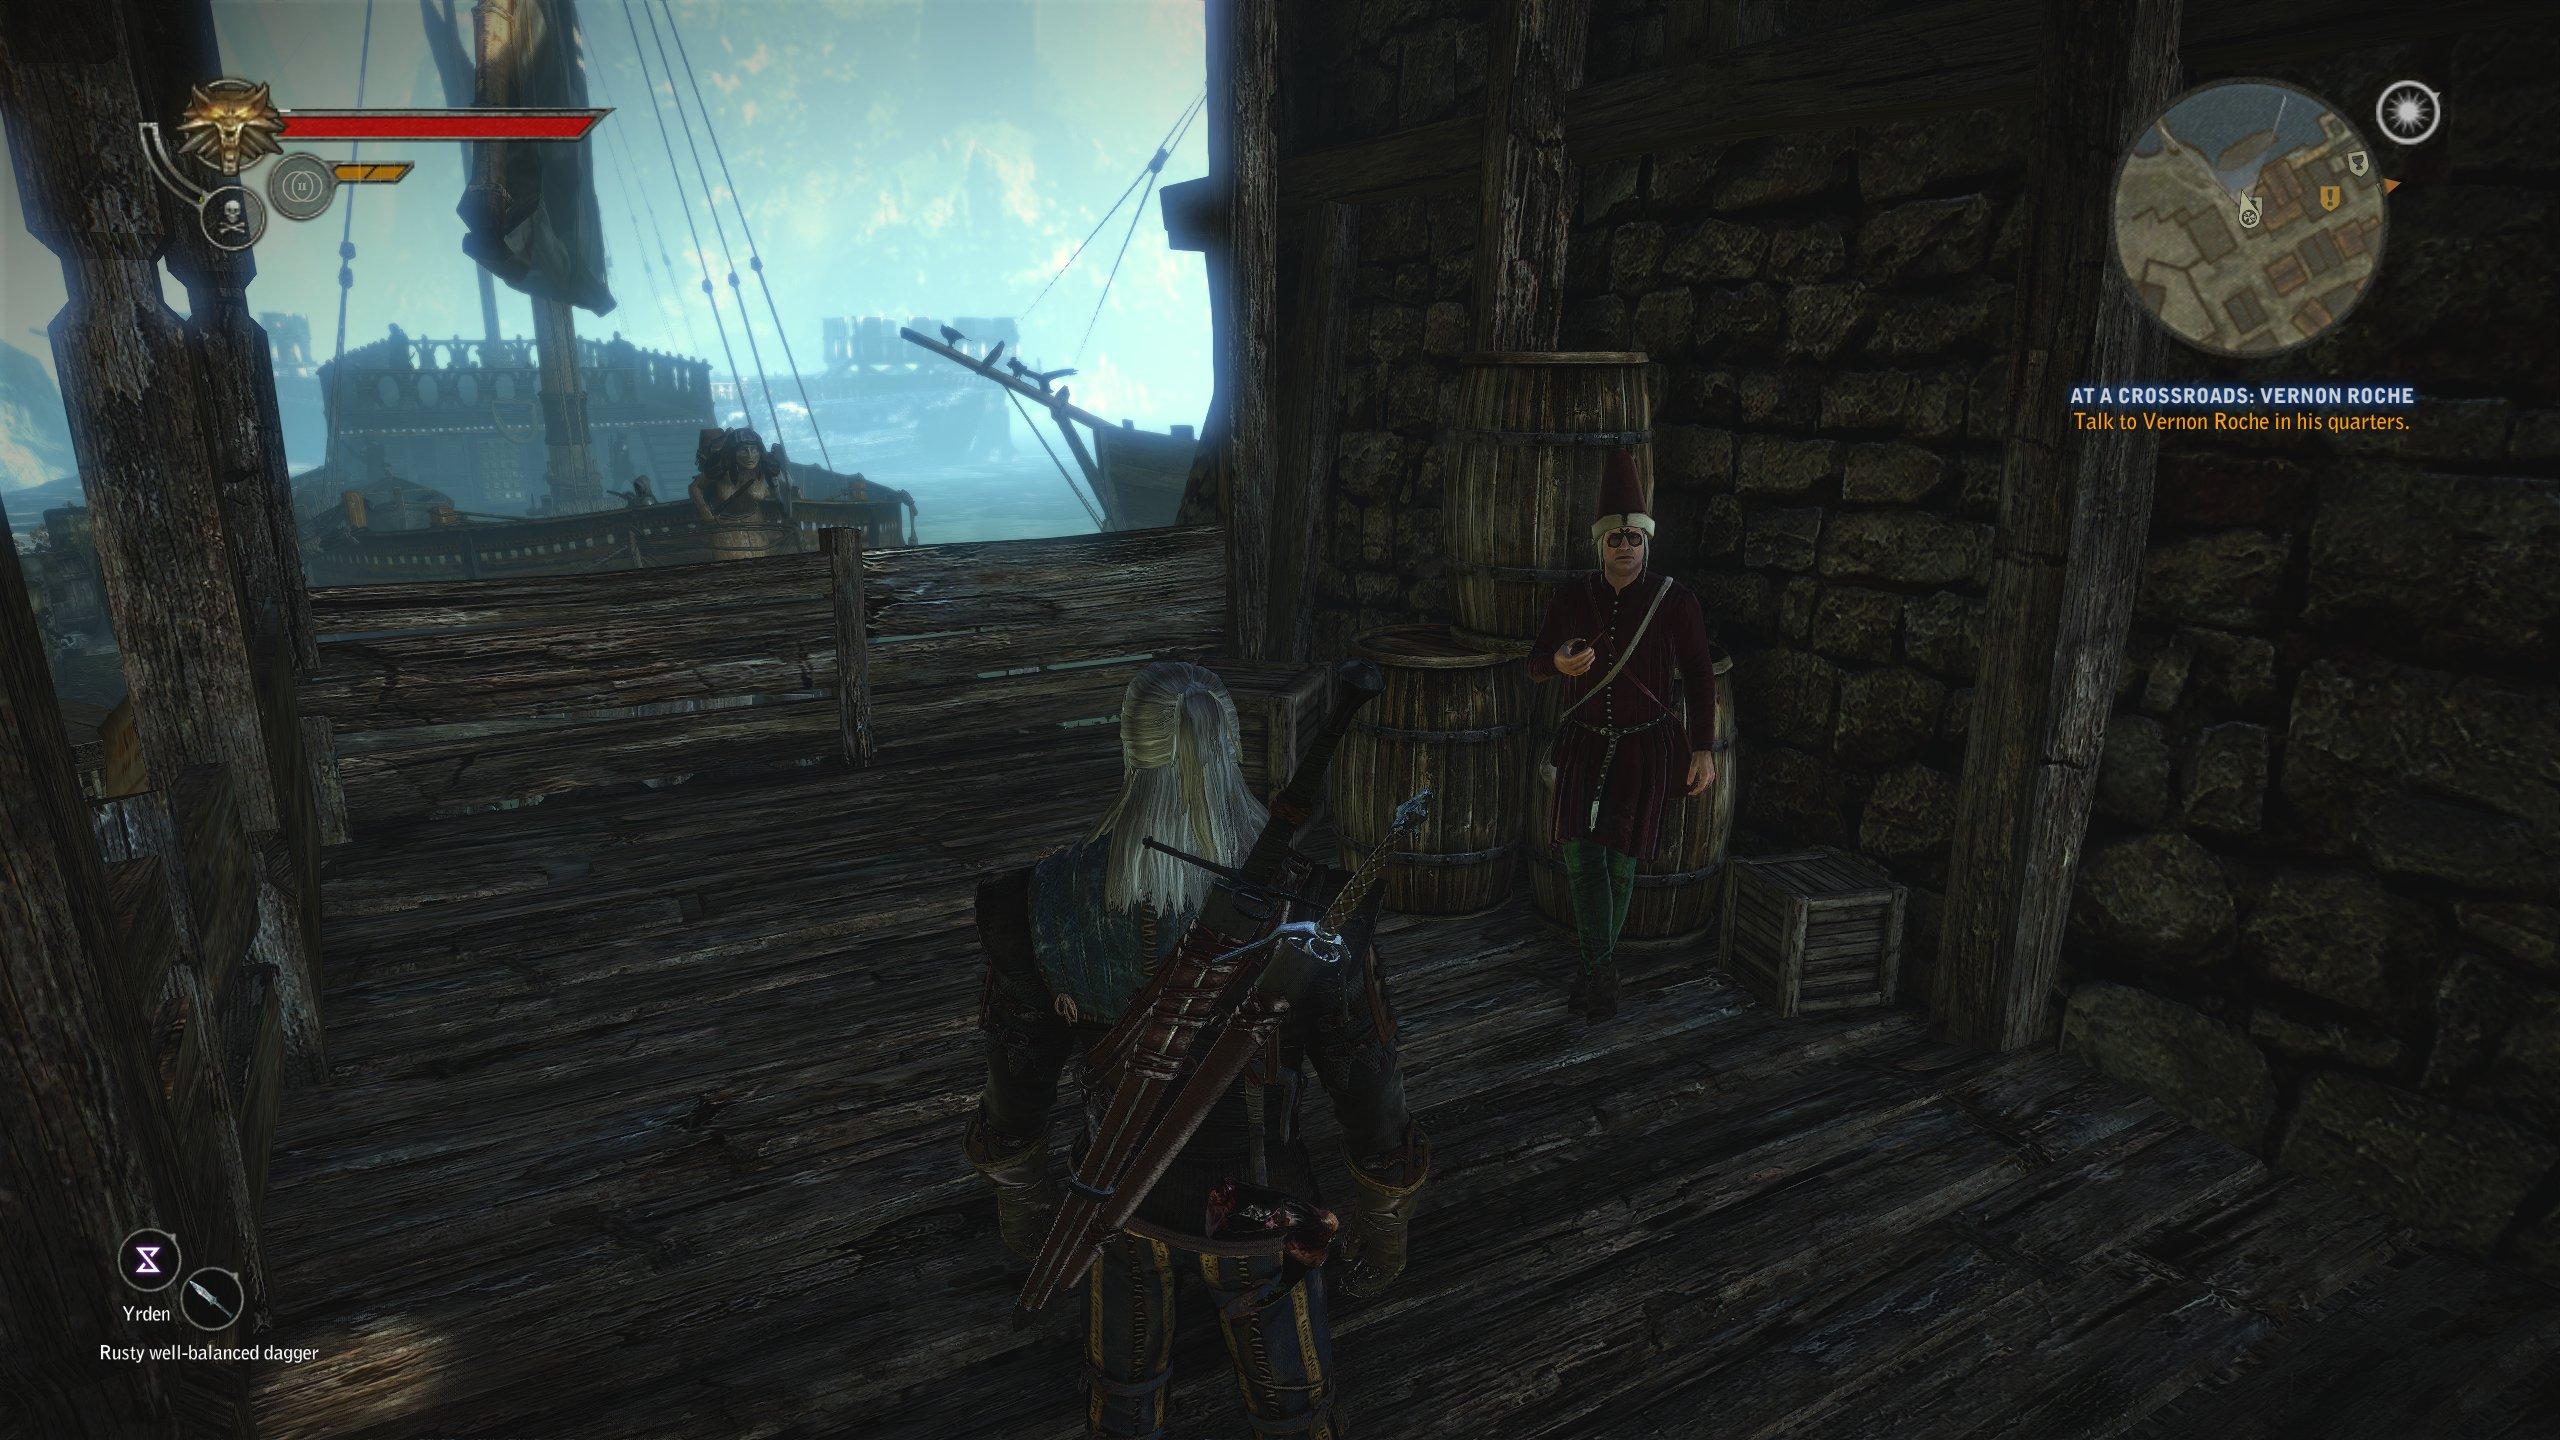 Tw2 screenshot mysteriousmerchant flotsam